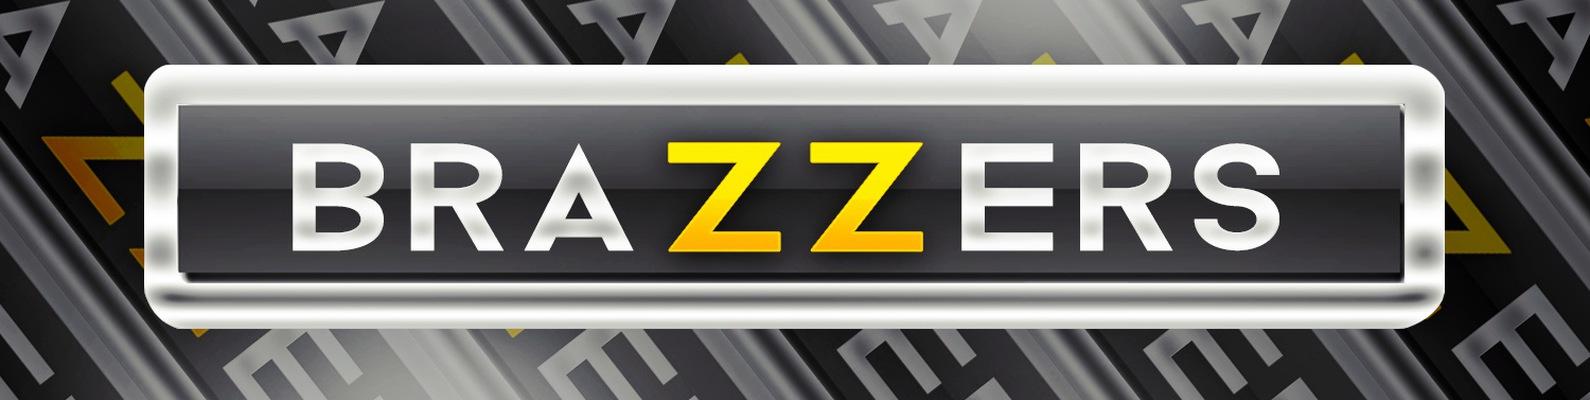 brazzers-novoe-porno-onlayn